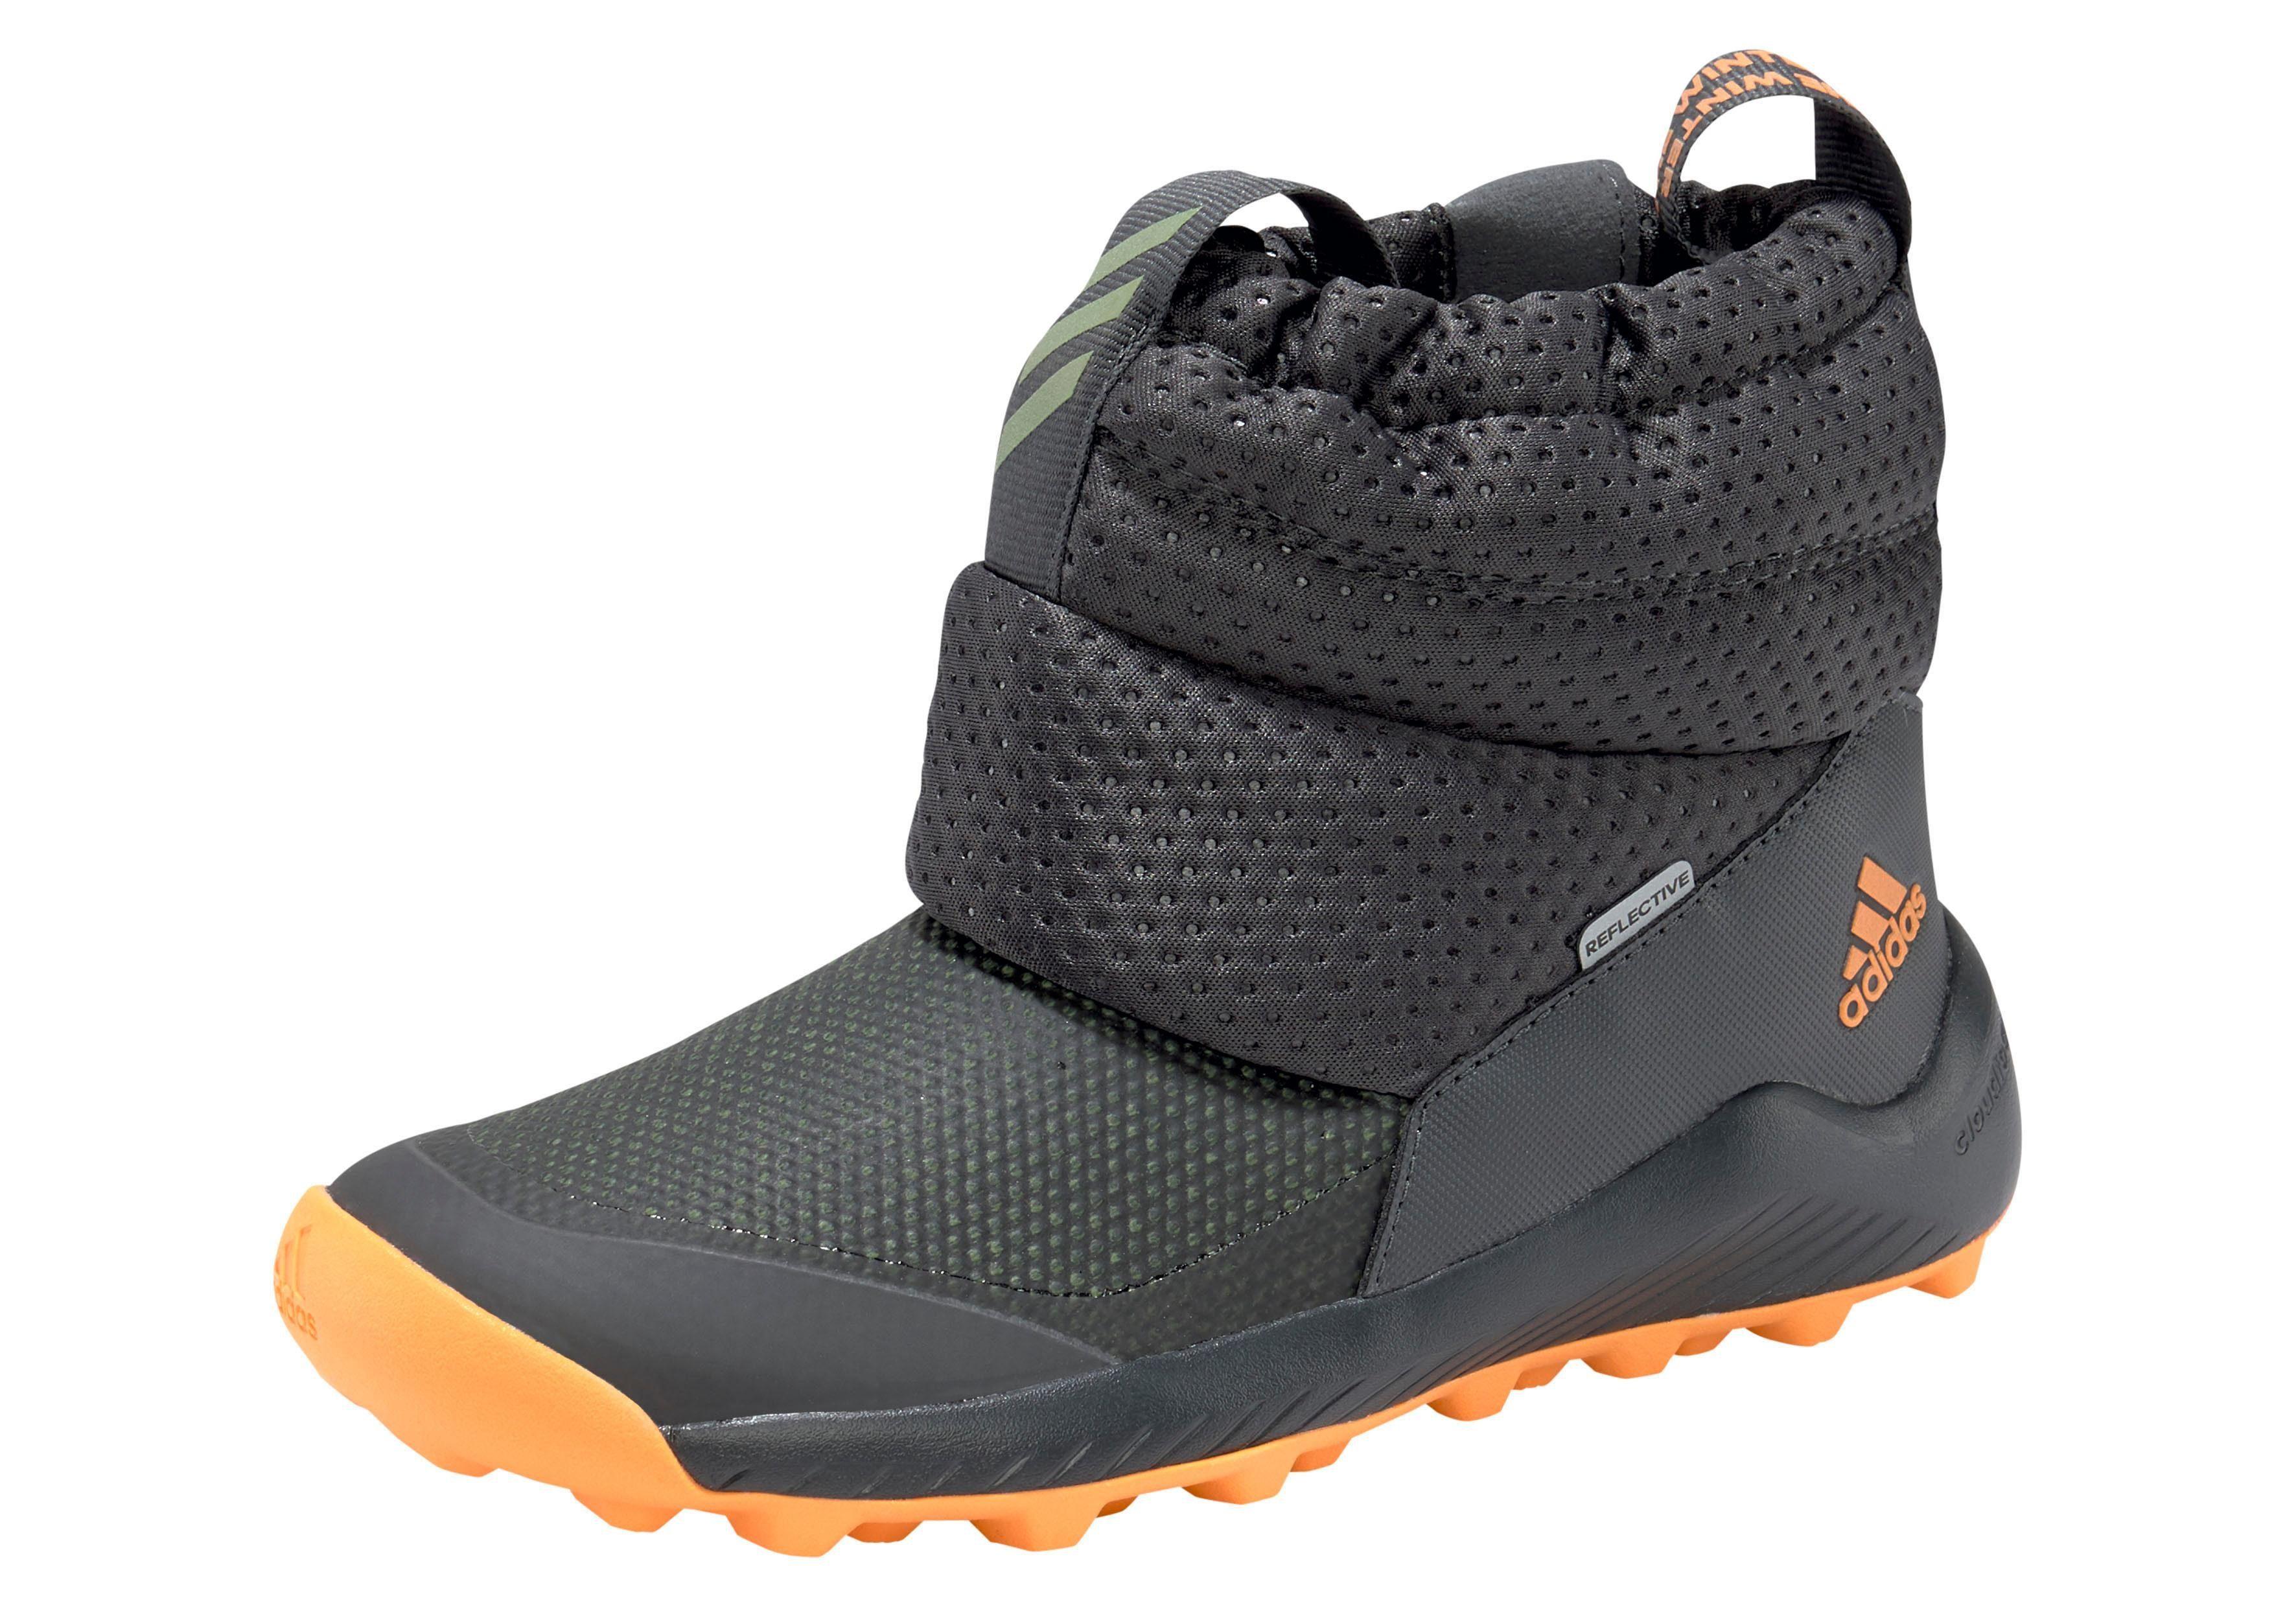 adidas Kinder Winter Schuhe Gr.26 Holtanna Snow Outdoor